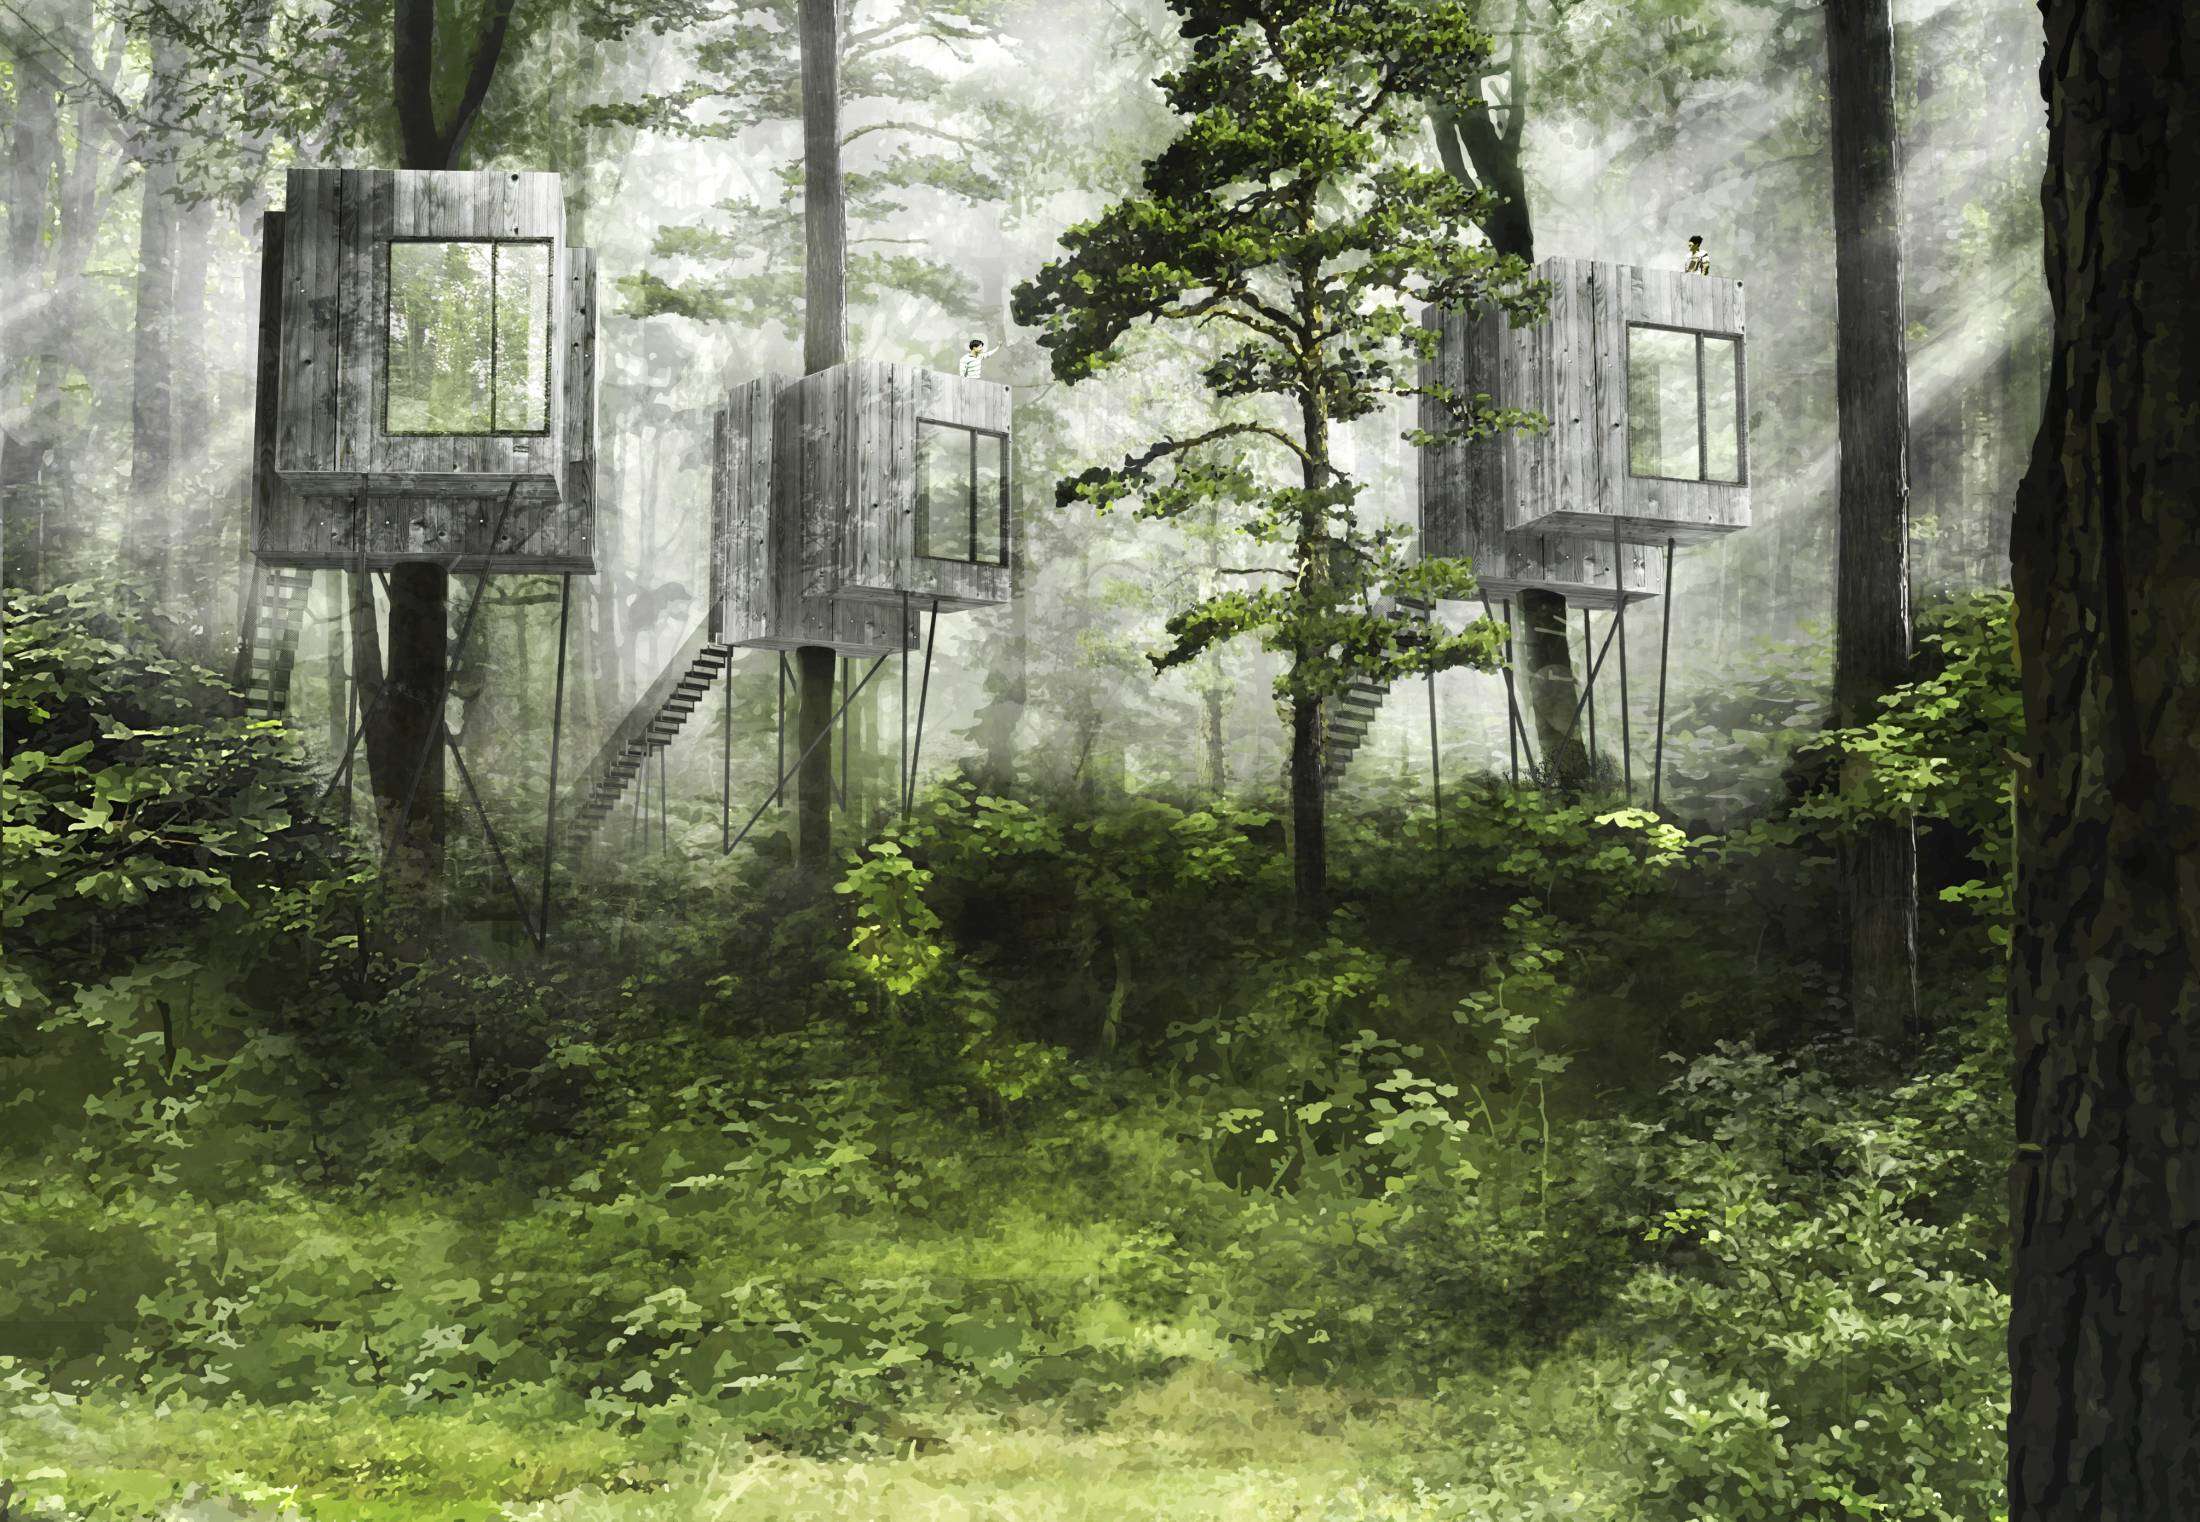 Treetop-Hotel_Denmark_lovtag_Architect-Sigurd-Larsen-axo-forest-PERSPECTIVE-FROM-WEST-1100x761@2x.jpg